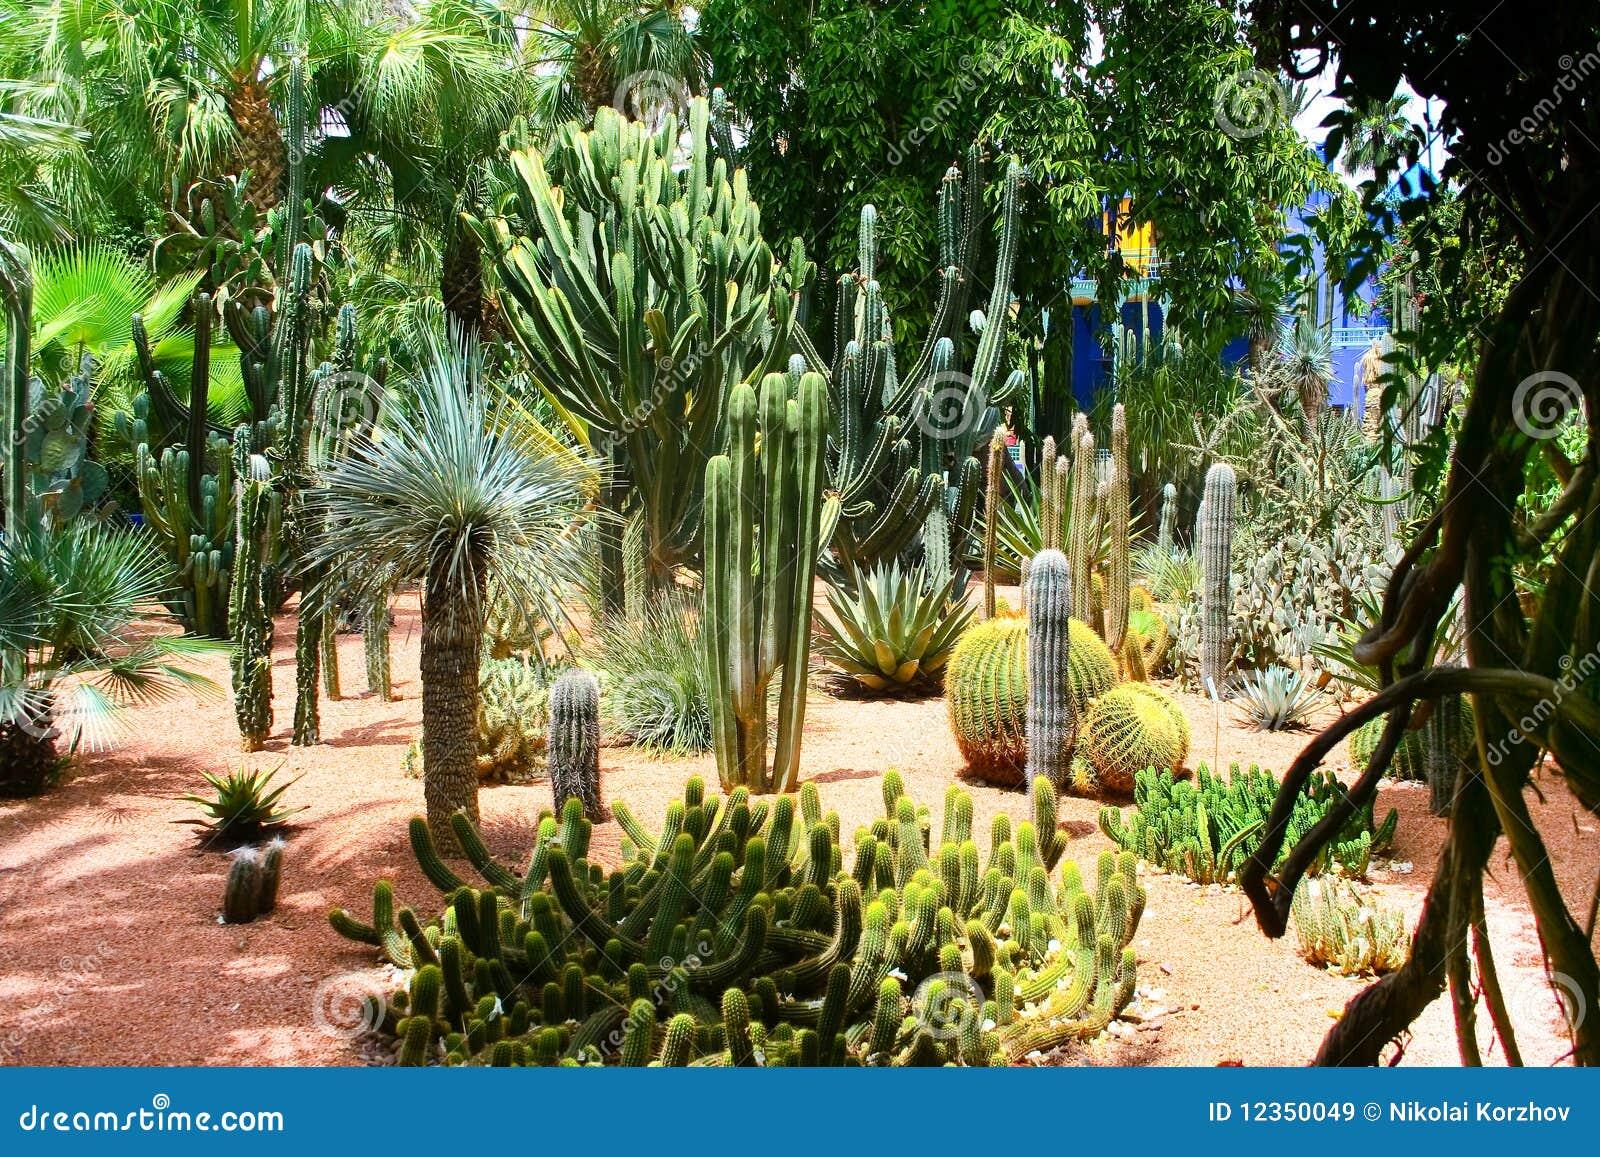 Jardine majorelle in marrakesh morocco royalty free stock for Jardin jardine